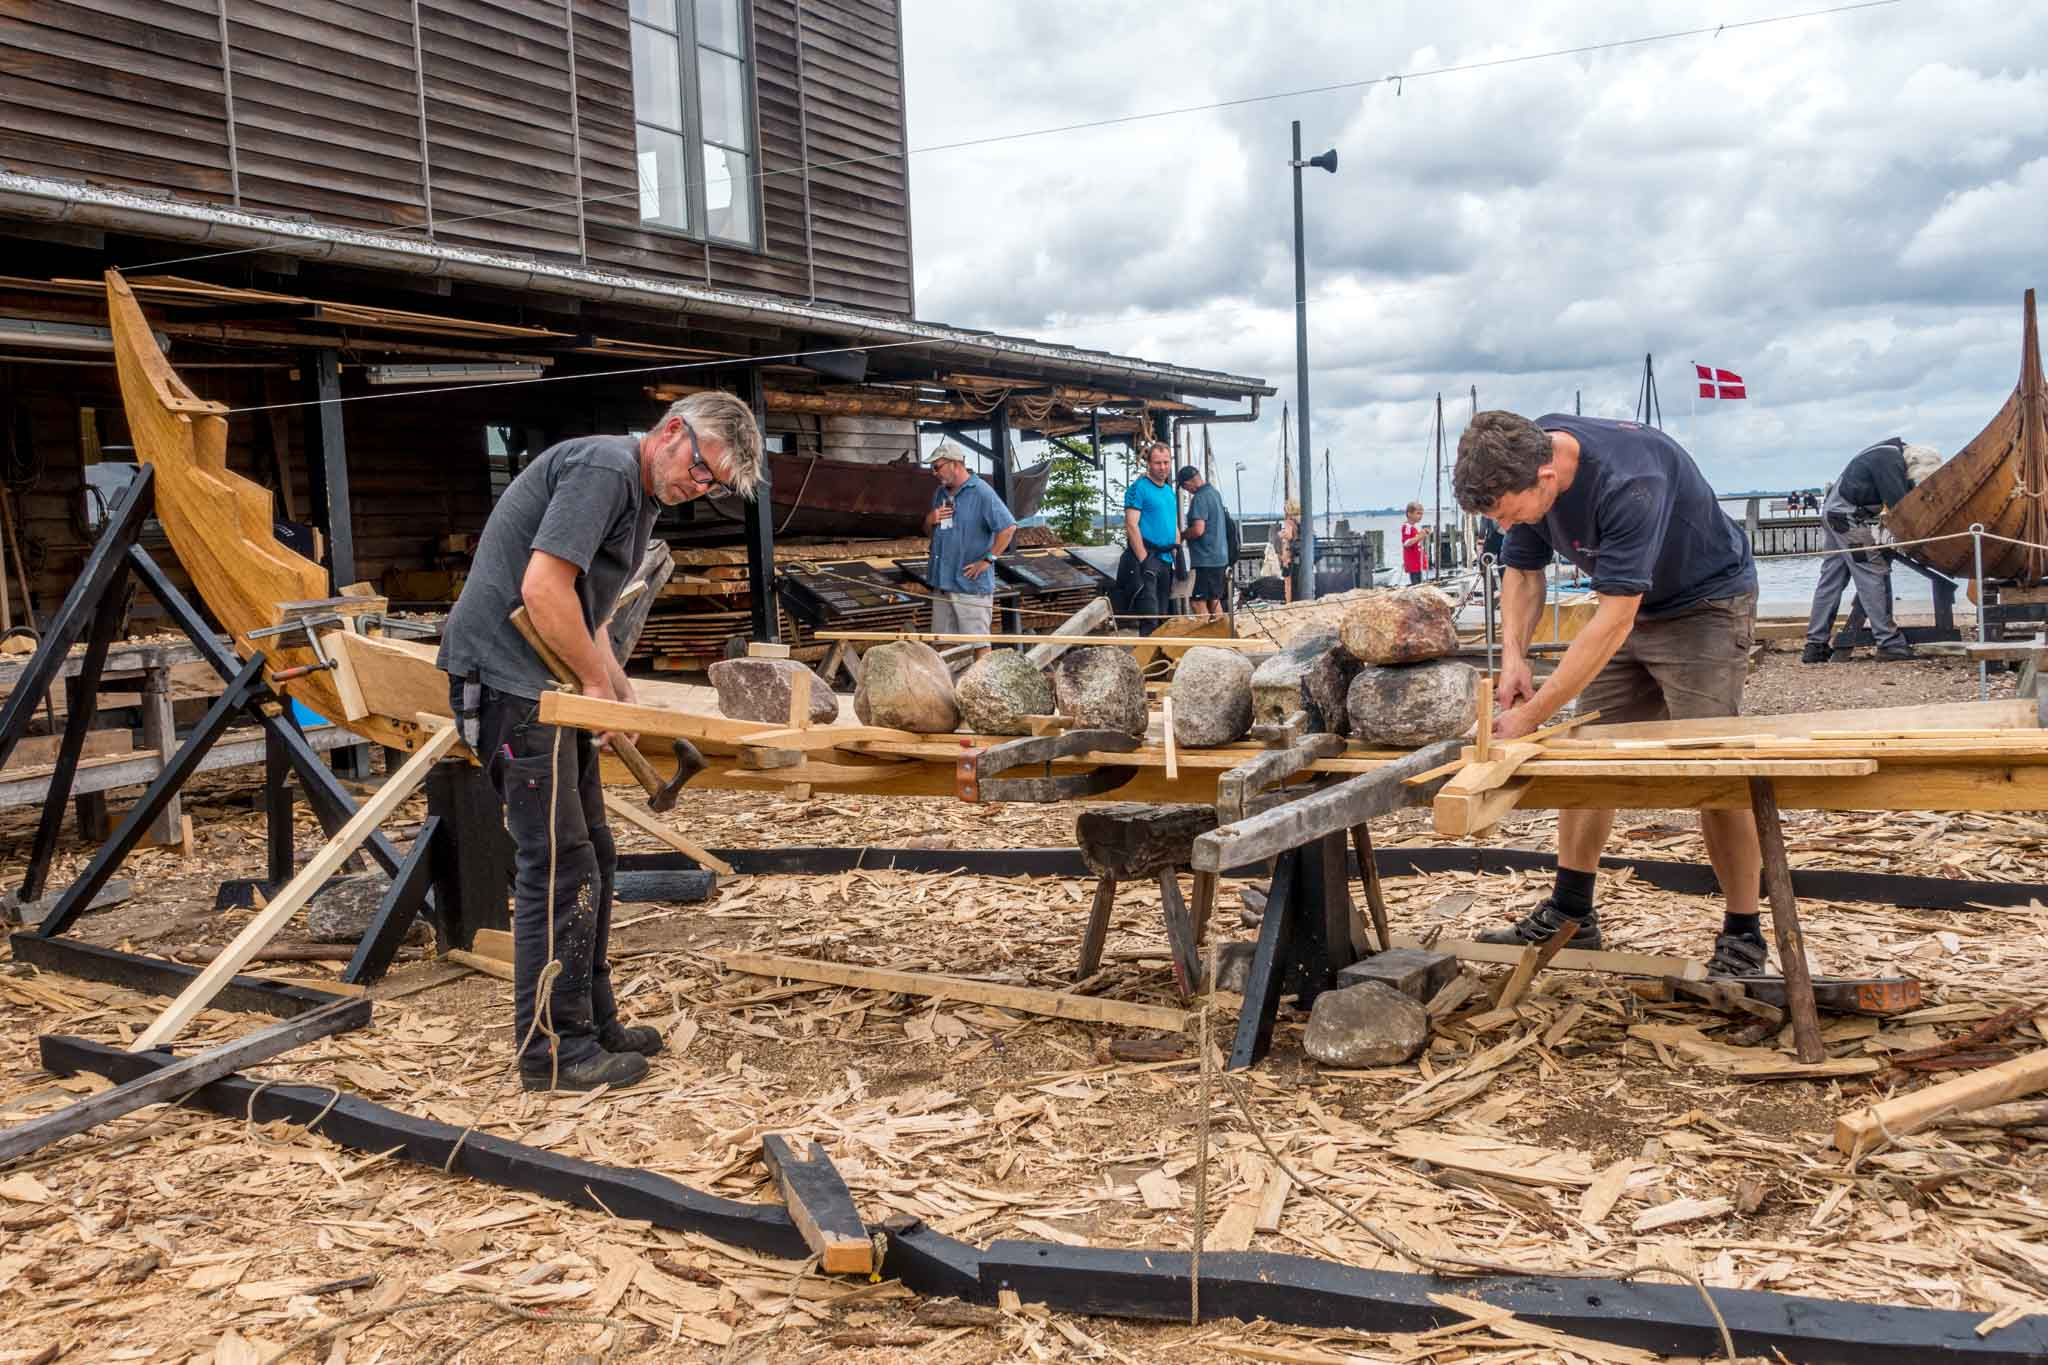 Expert builders building replica viking ships at the Viking Ship Museum in Roskilde, Denmark